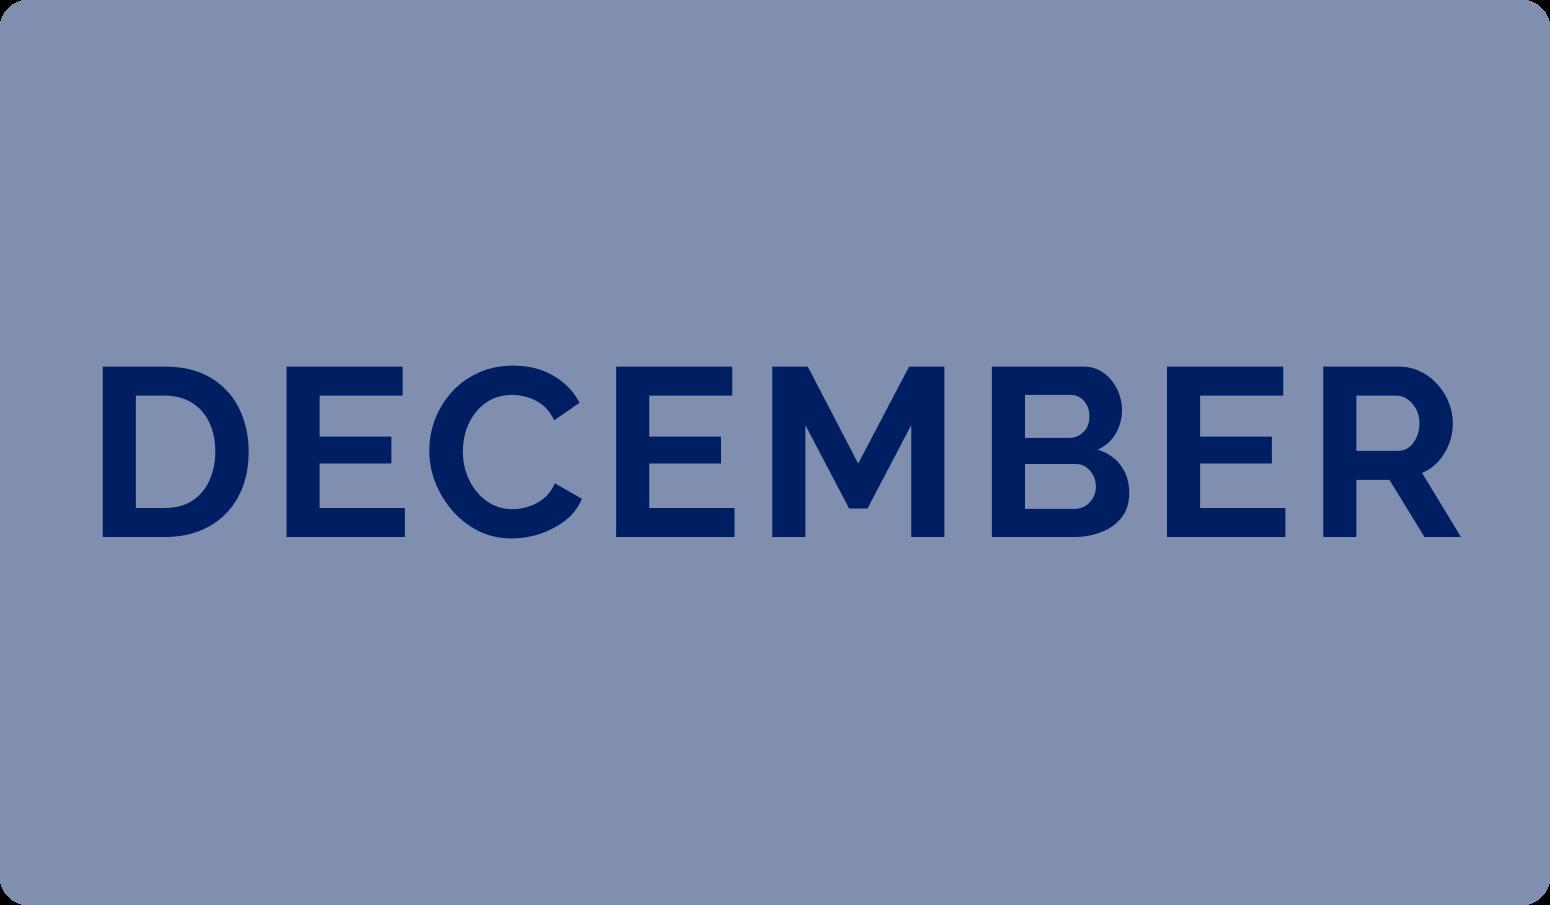 December ACT test